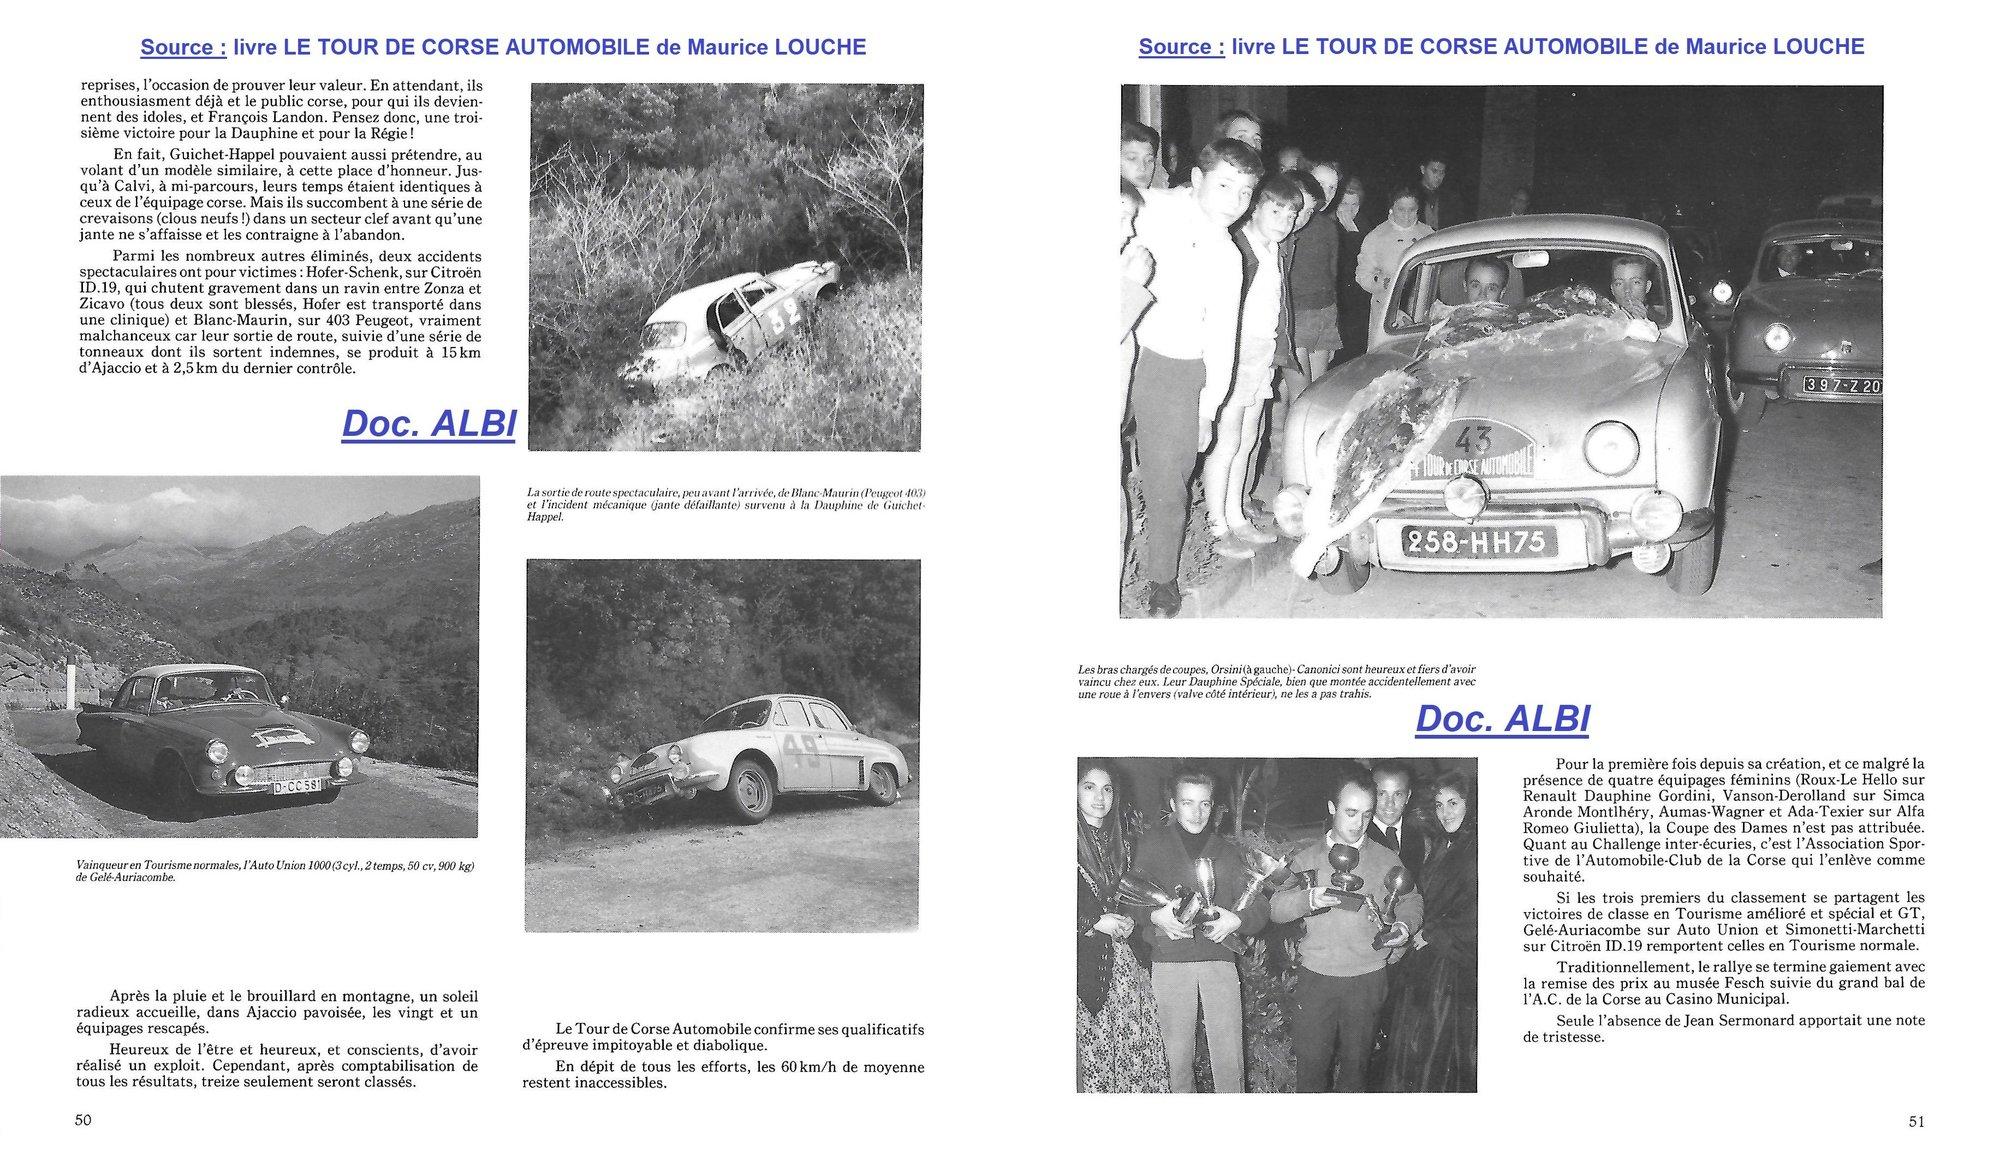 1959-Tour-Corse-M-Louche-06-07-a.thumb.jpg.f1a9c316499a4f95c080df7b9e22eef7.jpg